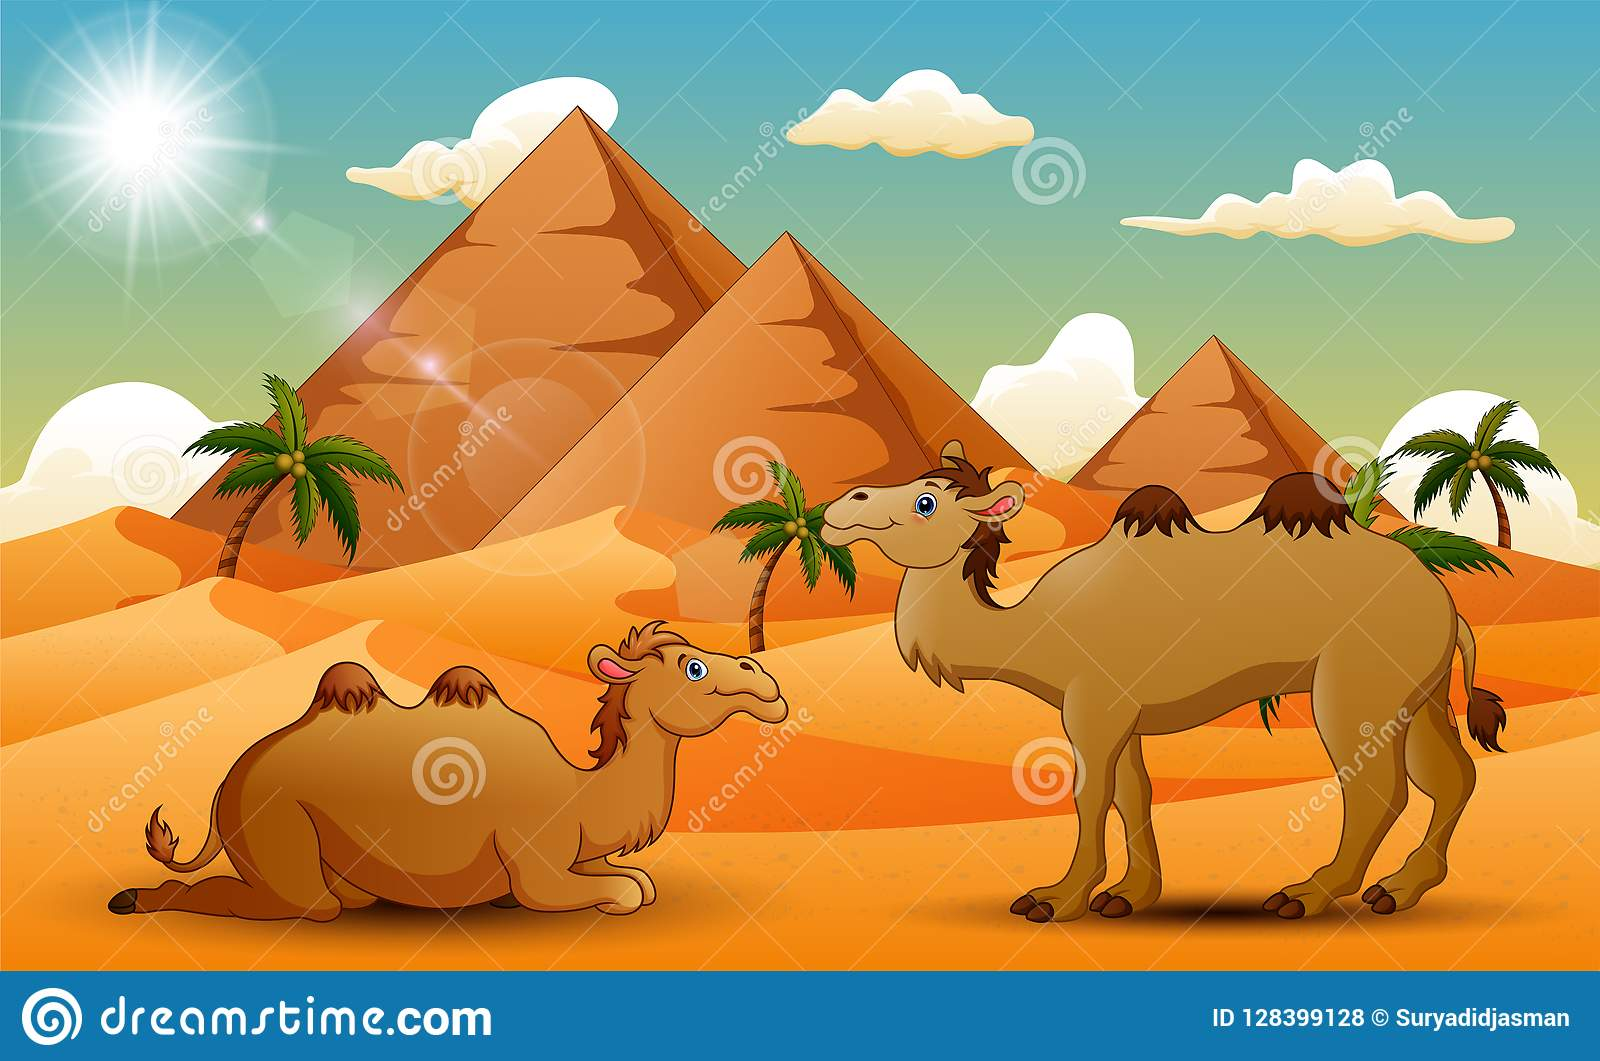 Cartoon Of Two Camel In The Desert Stock Vector